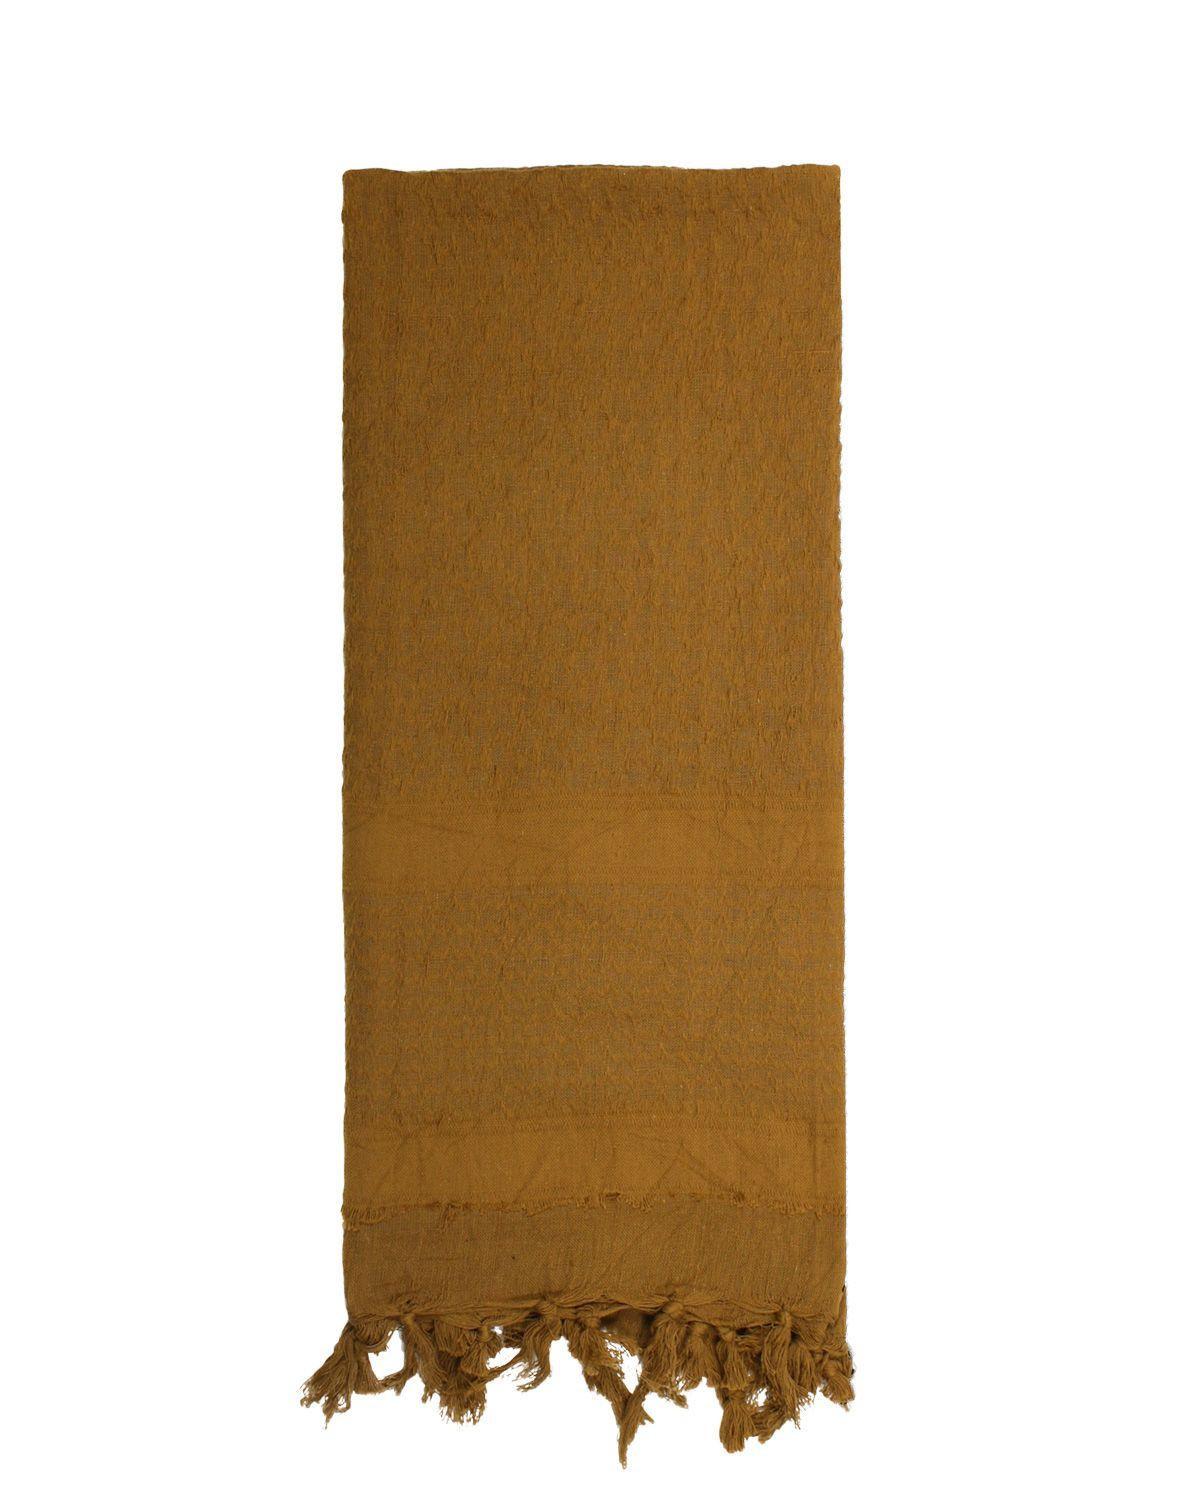 Image of   Rothco Deluxe Partisan Tørklæde Ensfarvet (Coyote Brun, One Size)